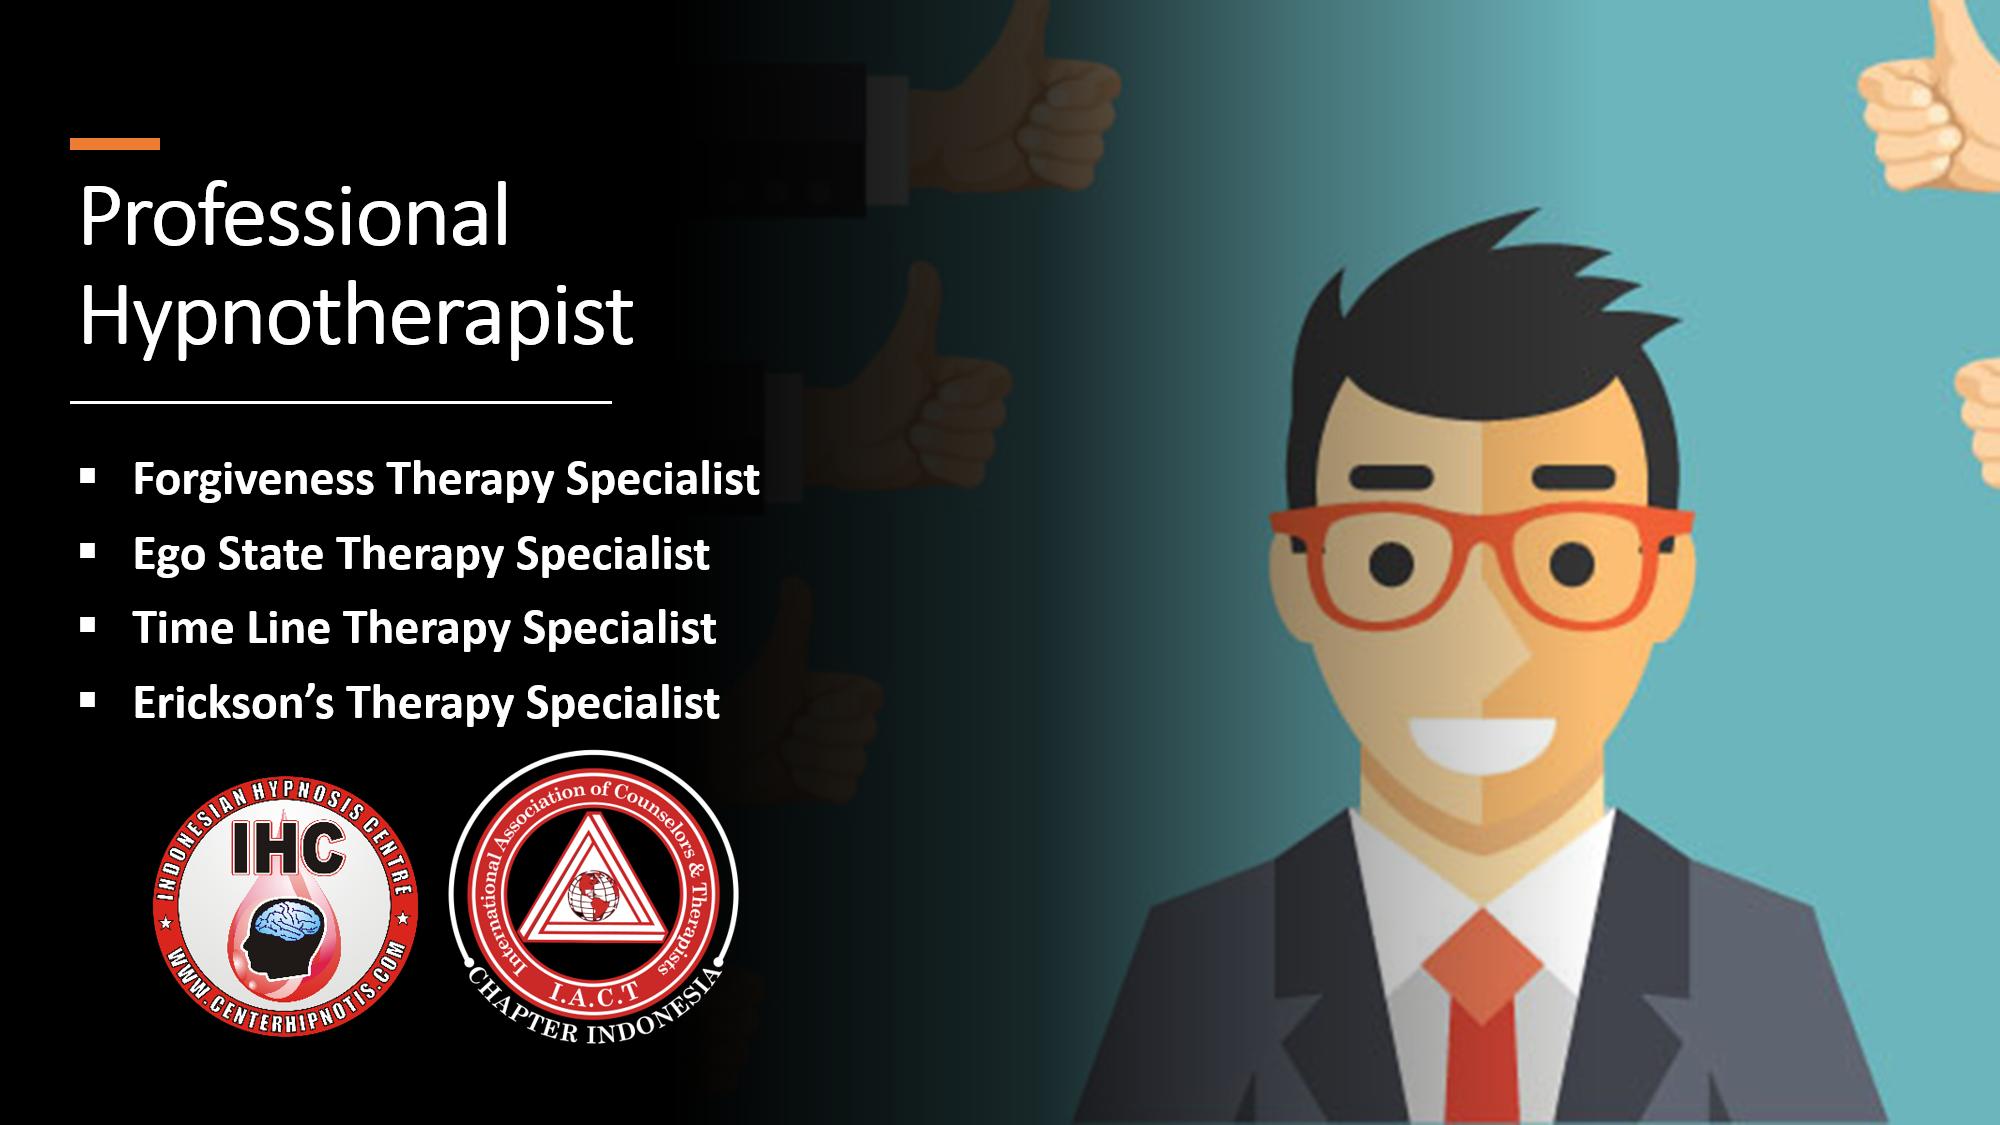 Professional Hypnotherapist